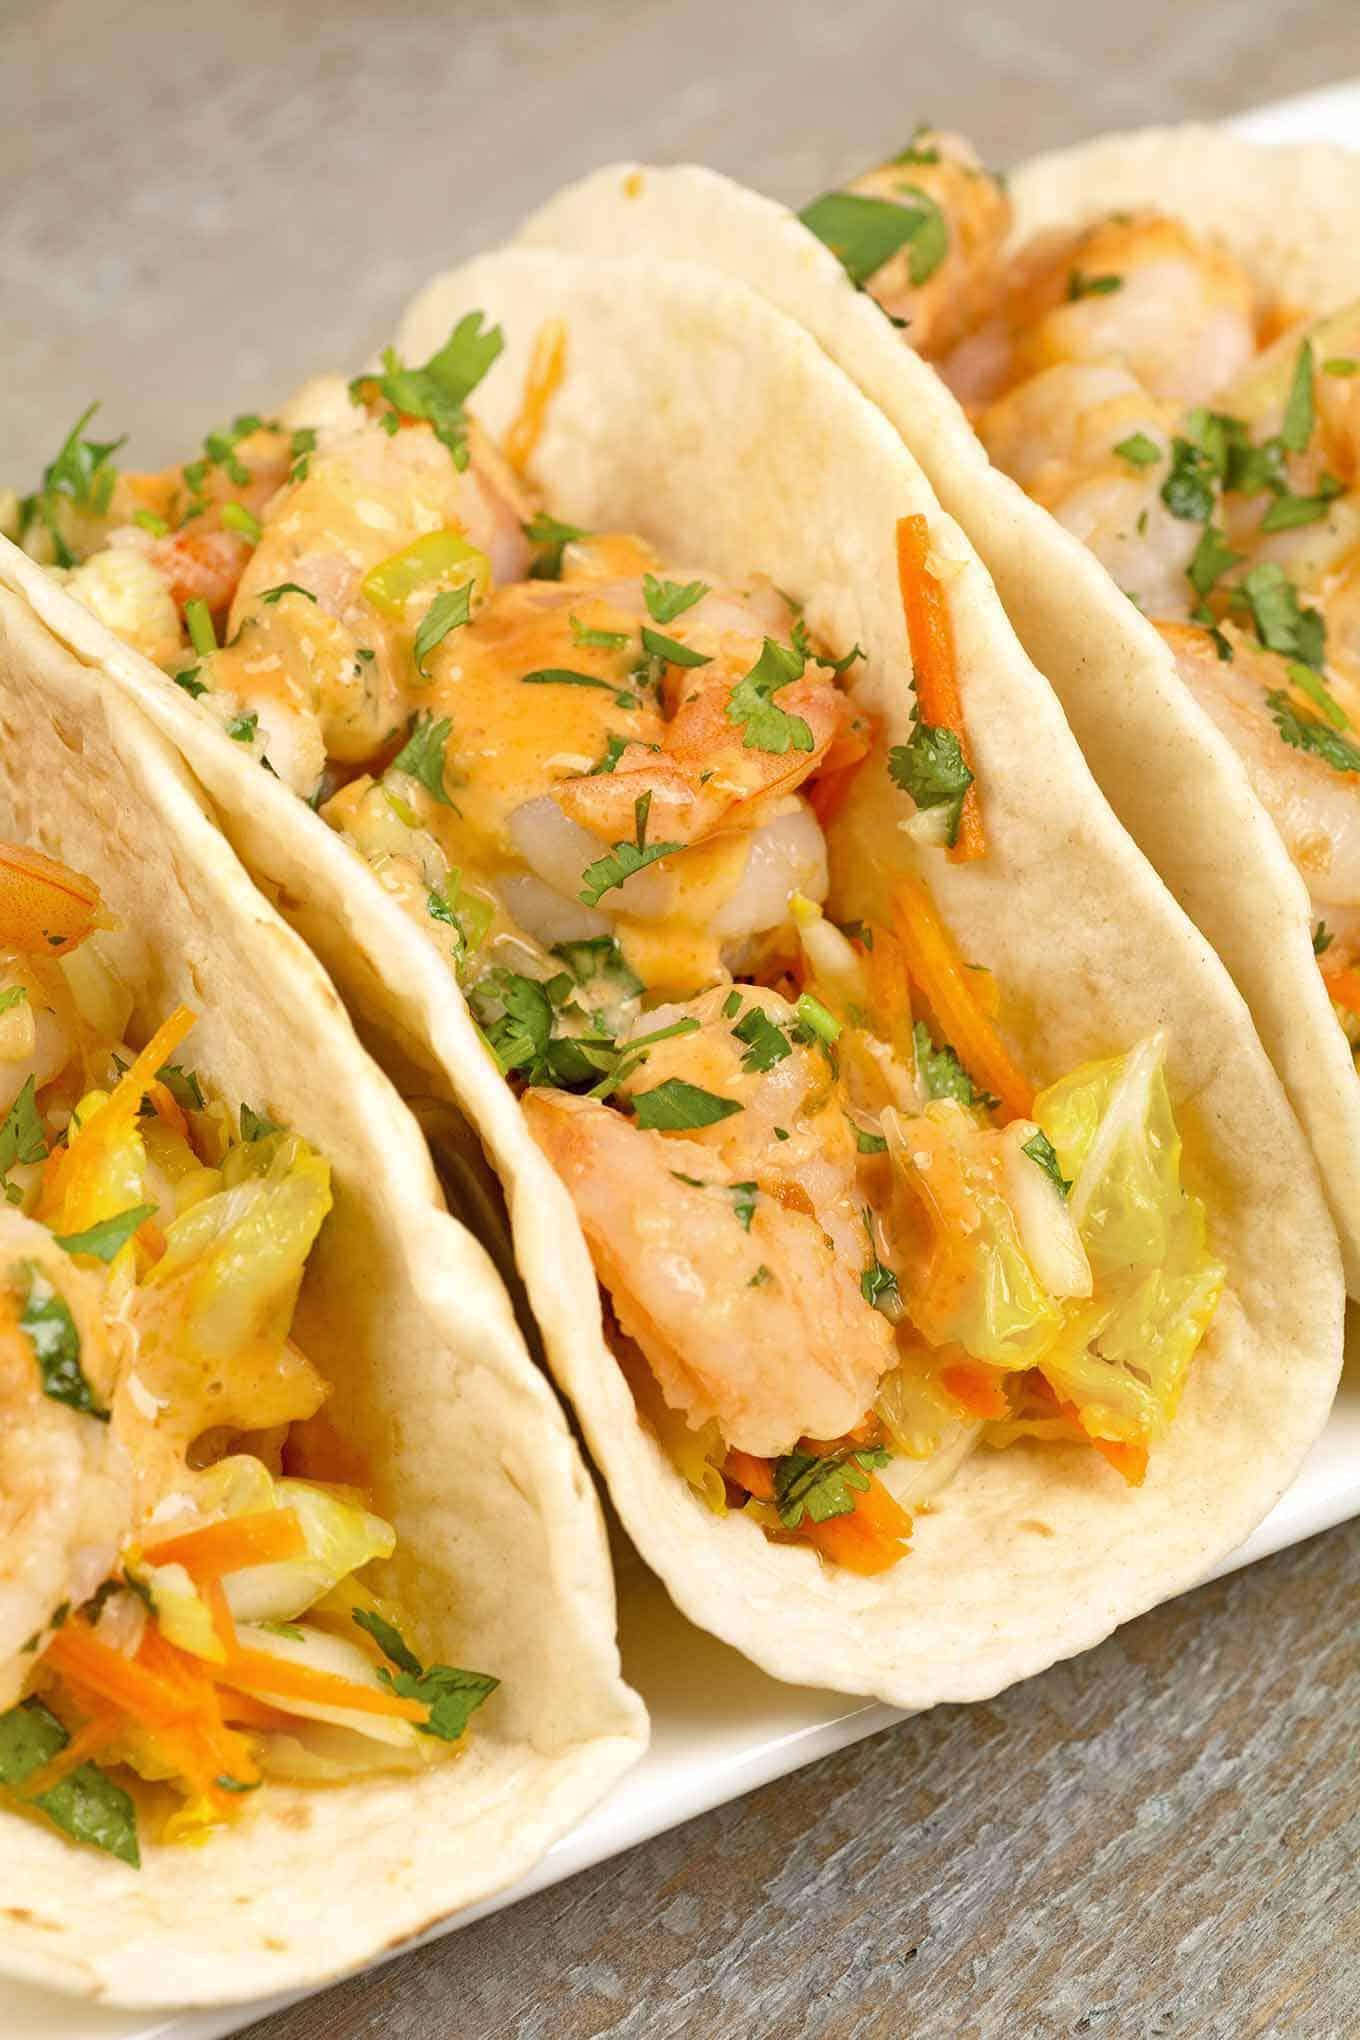 Stir-Fried Shrimp Tacos with Sriracha May